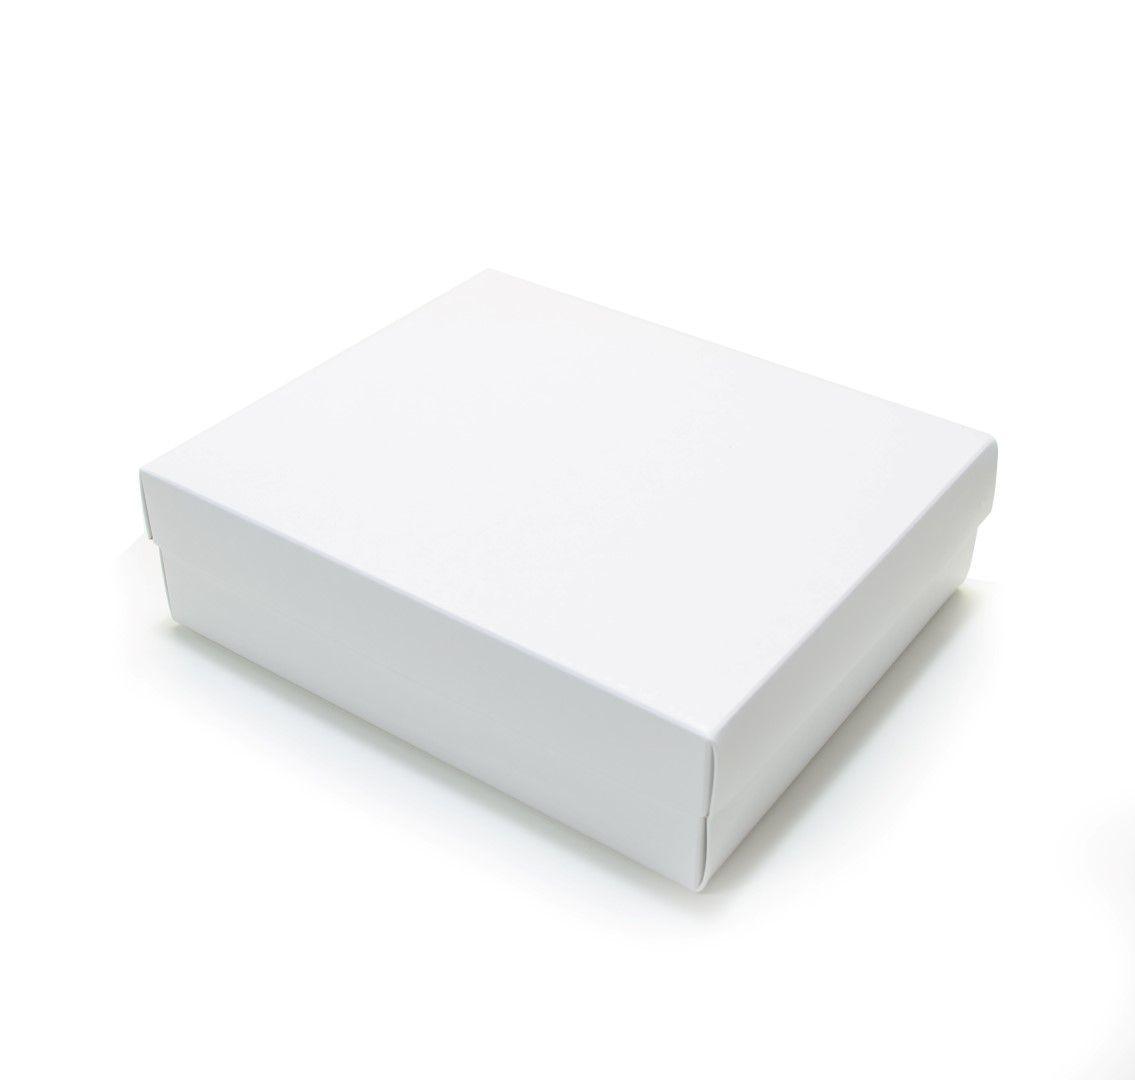 Ref 025 Branca - Caixa - 21,5x18,5x6,5 cm - c/ 10 unidades